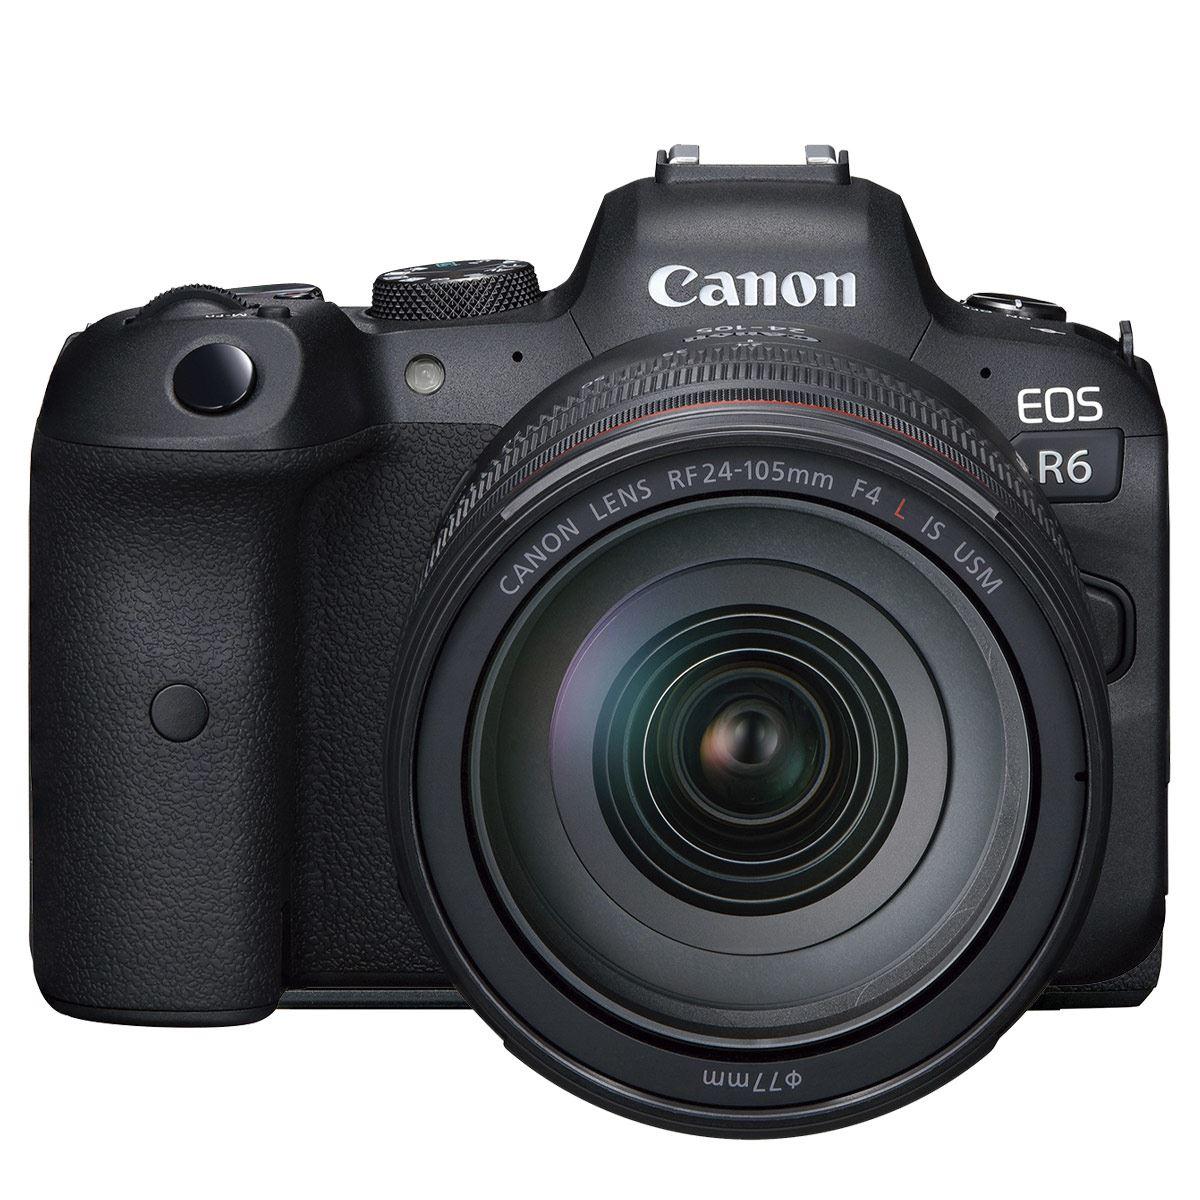 Cámara Canon EOS R6 + Lente RF 24-105mm F4 L IS USM